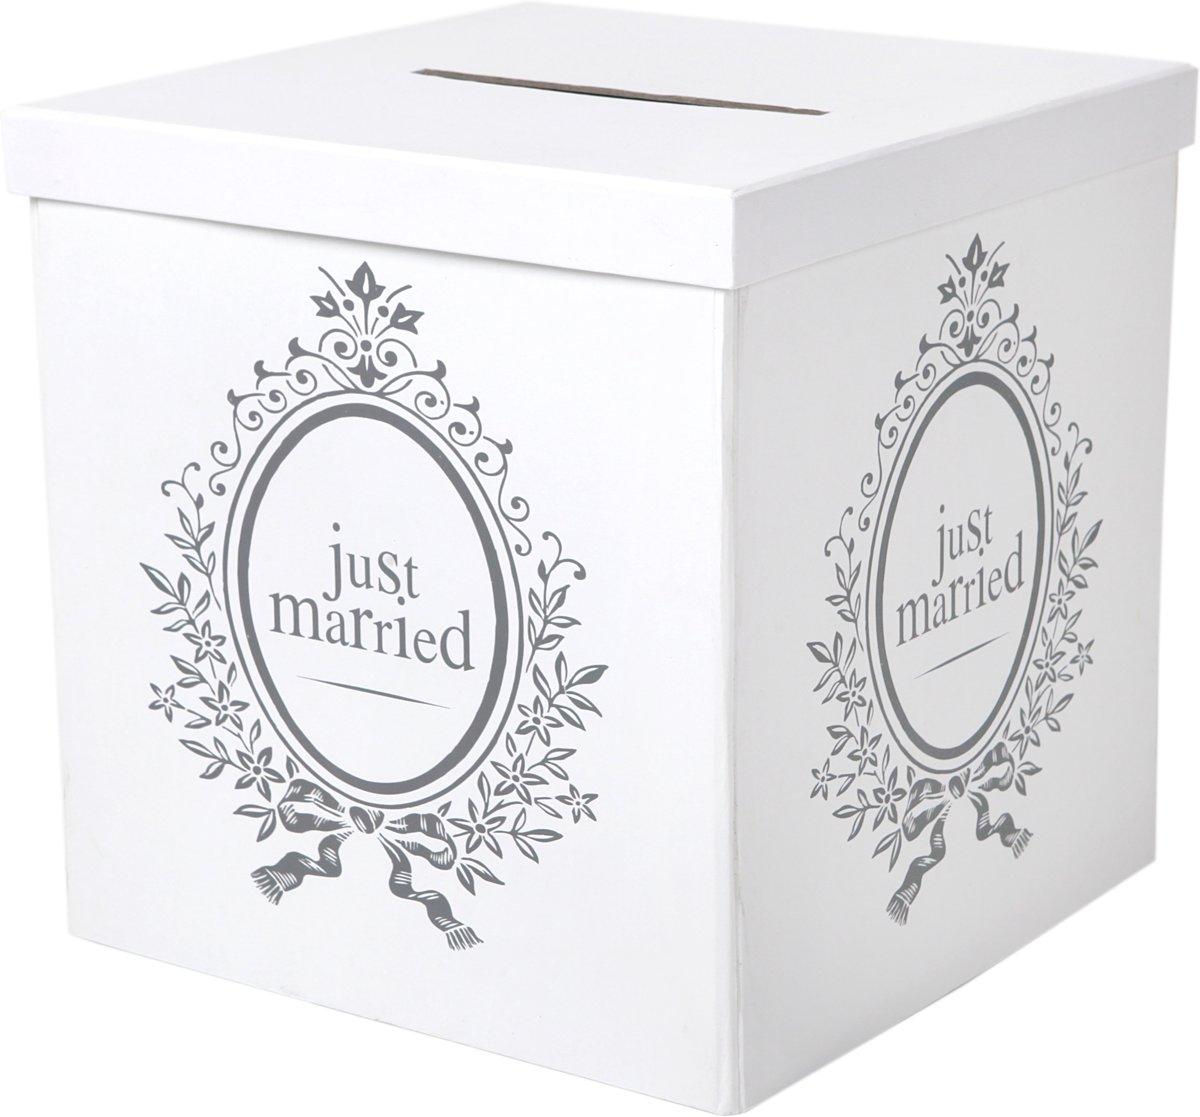 Santex Enveloppendoos Just Married - karton kopen